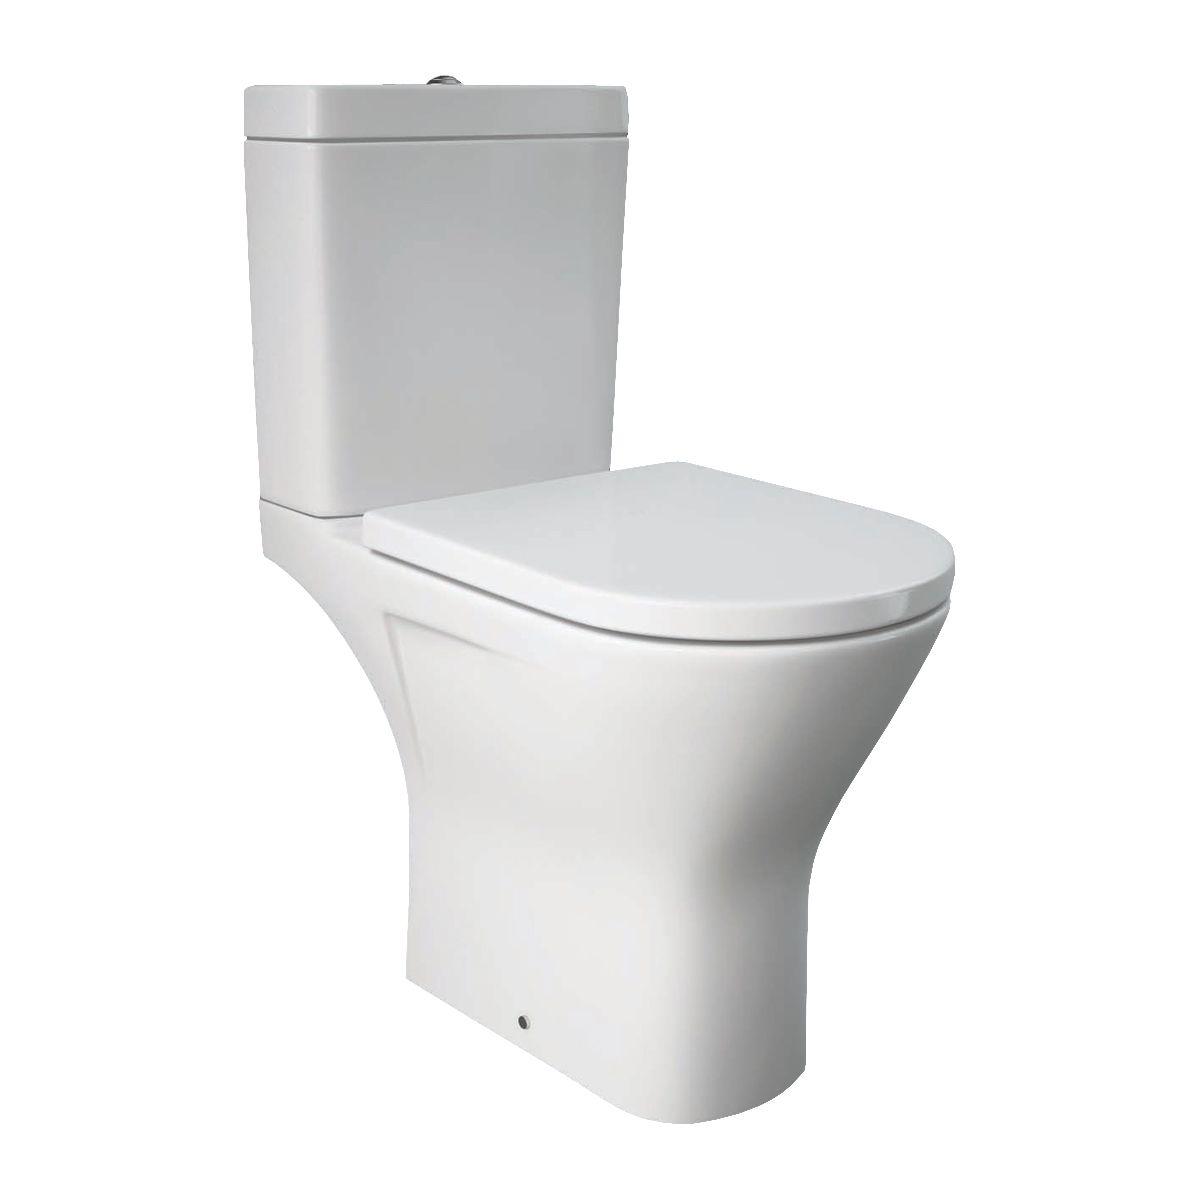 RAK Resort Mini Full Access Rimless Close Coupled Toilet